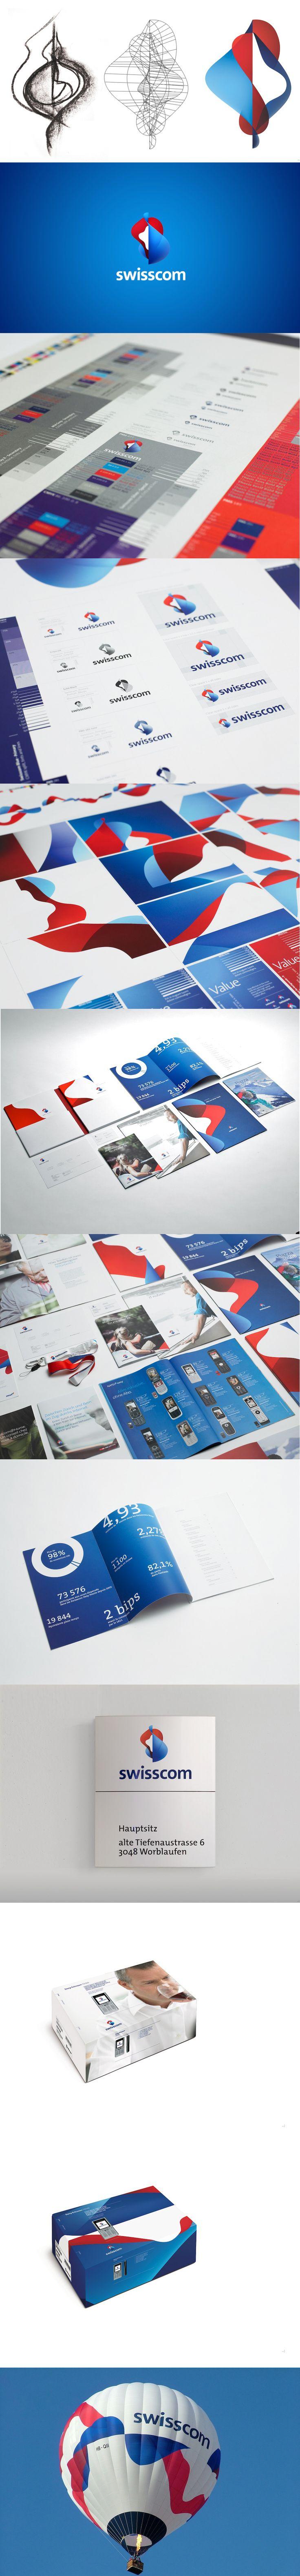 Swisscom brand identity by Moving Brands